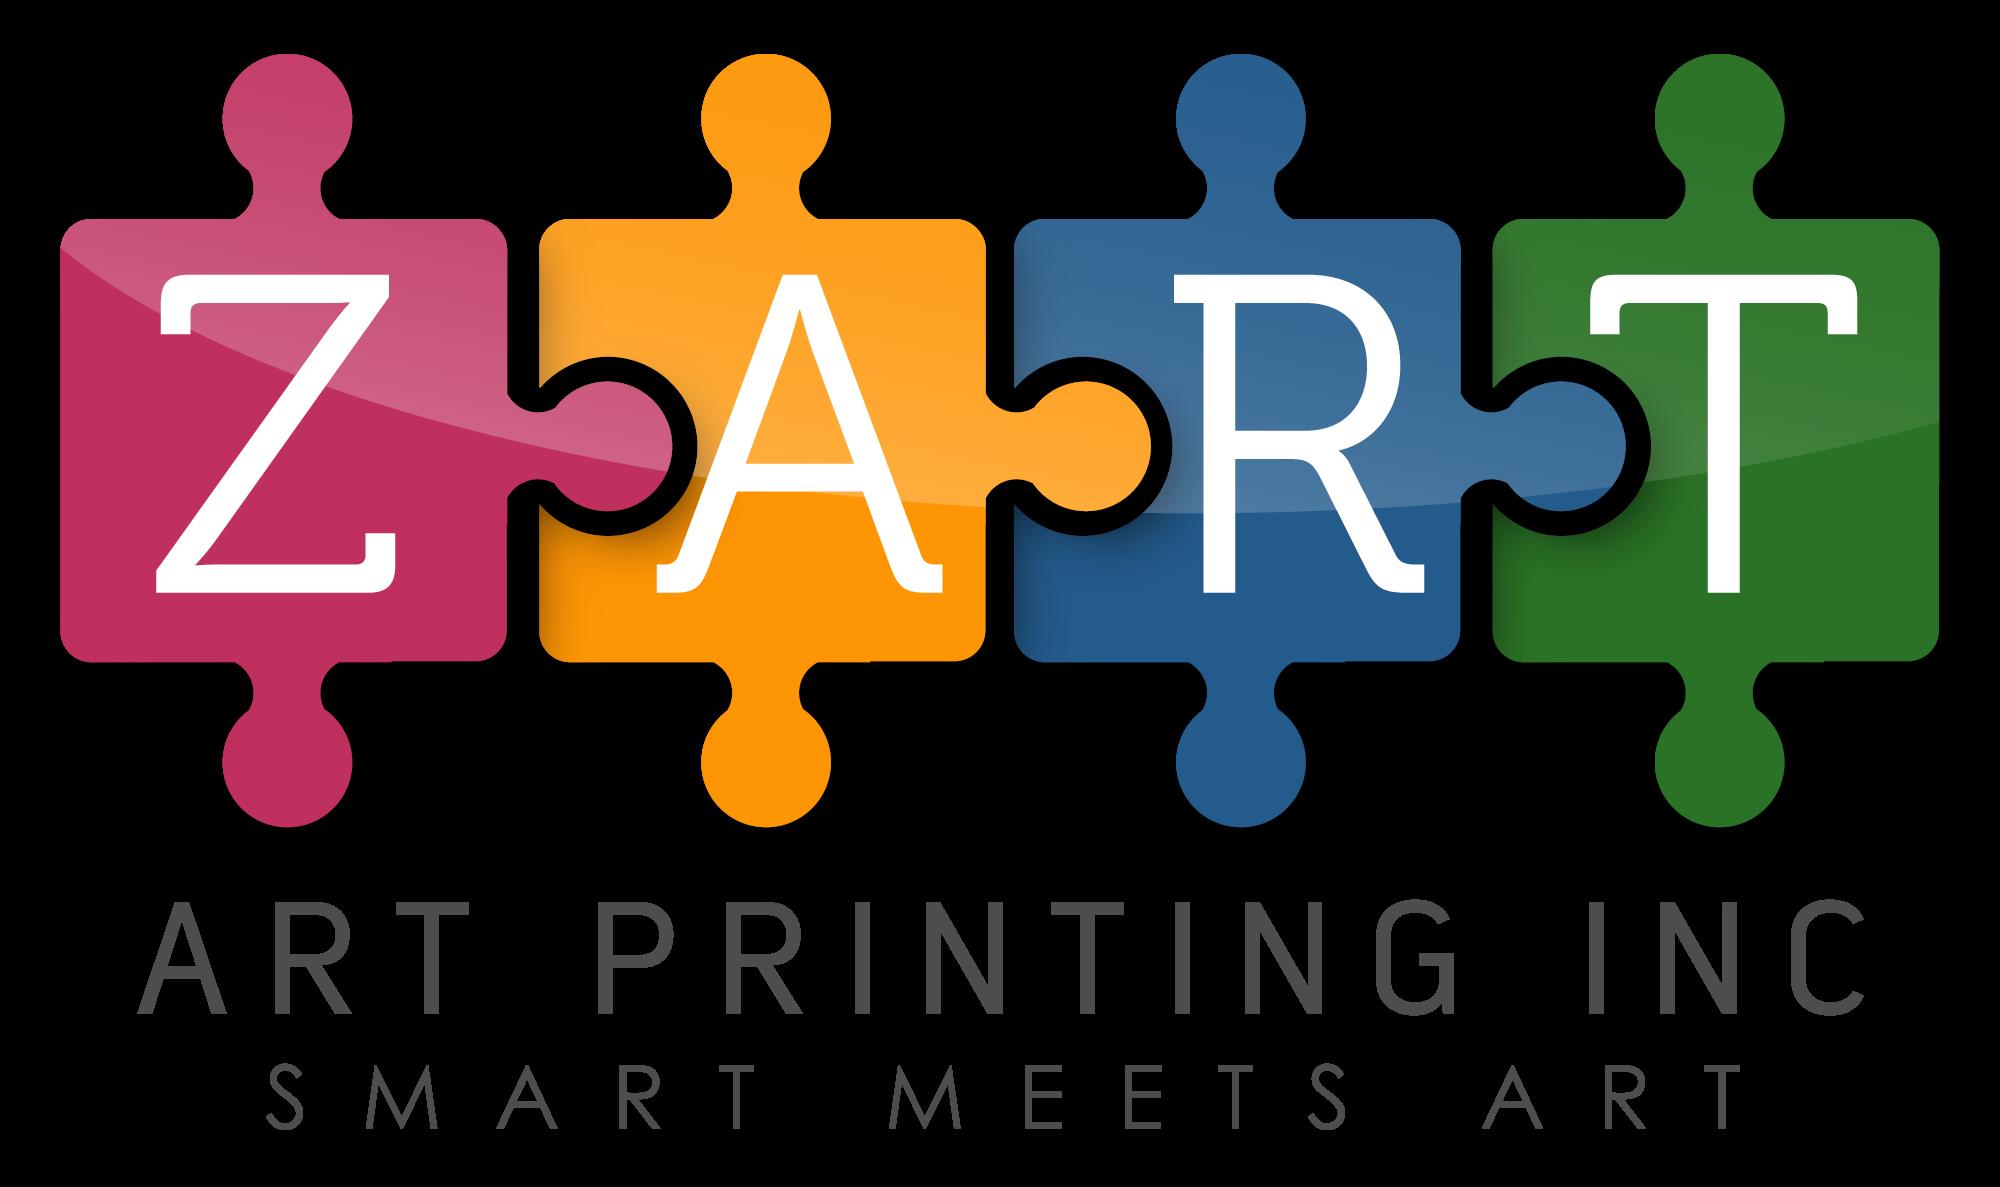 Zart Art Printing, Inc.